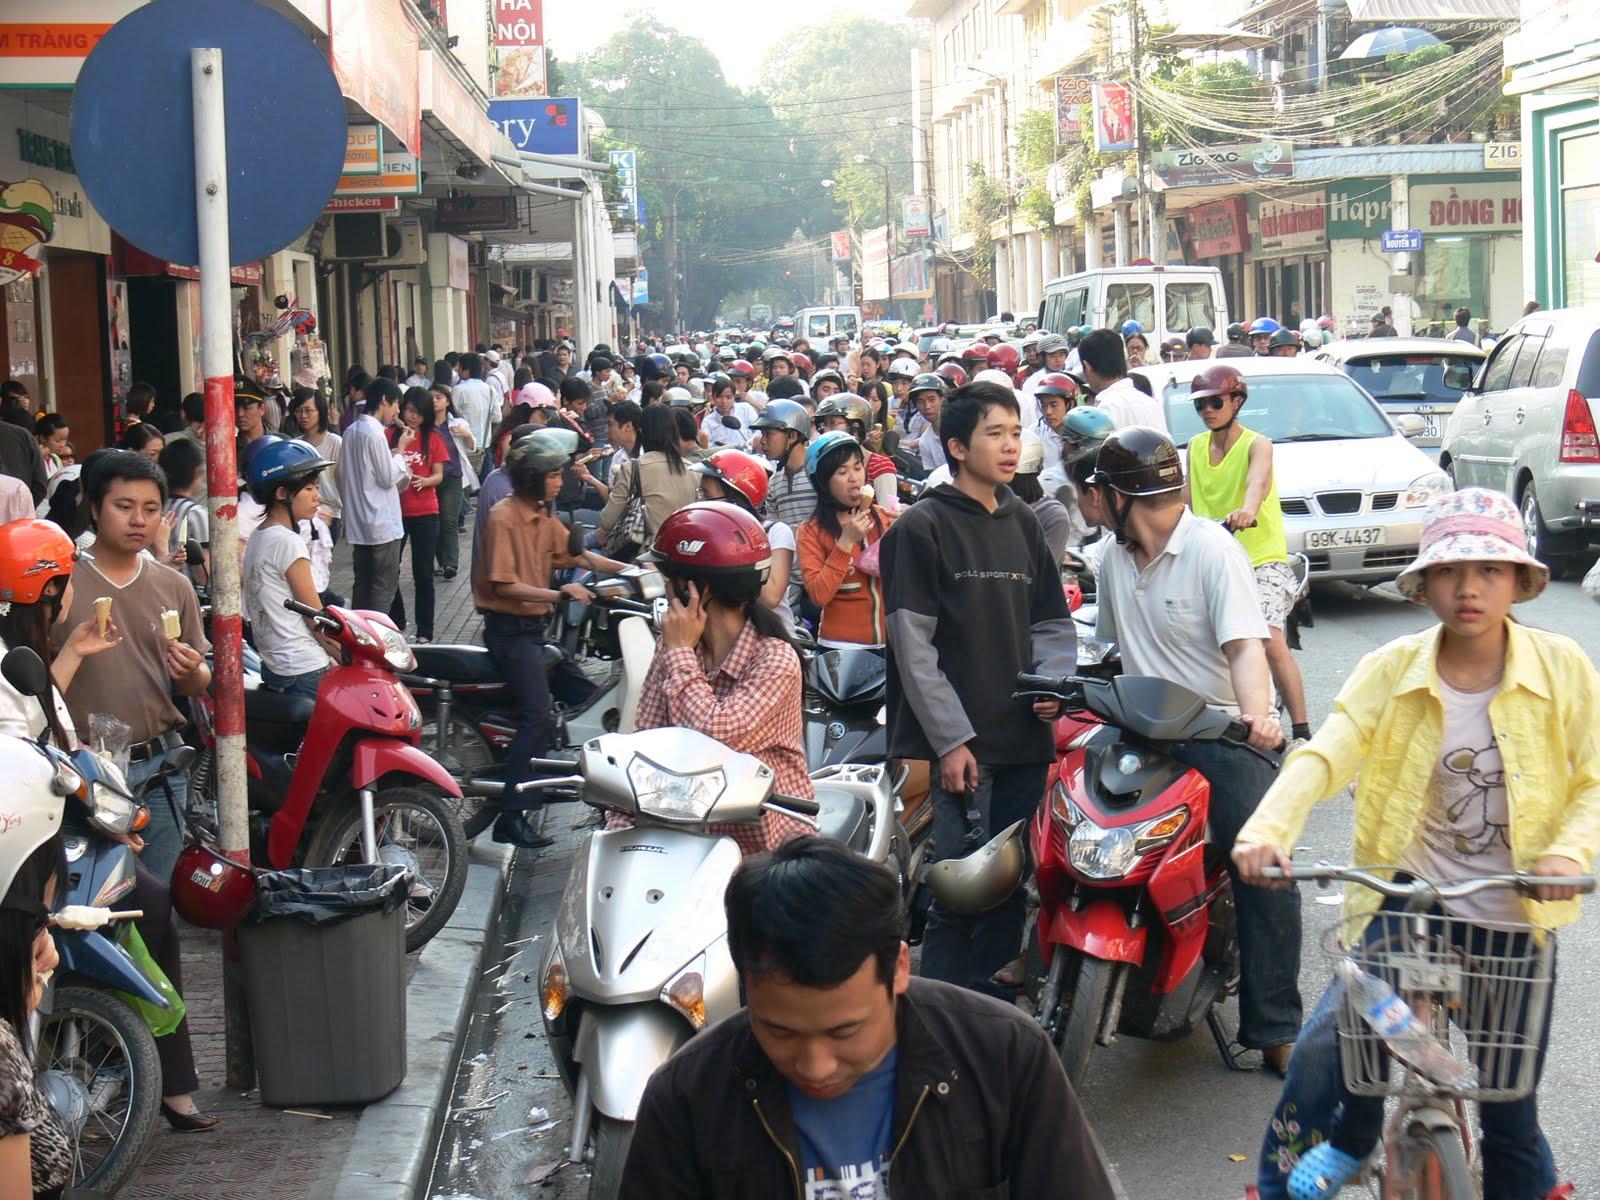 Trang Tien